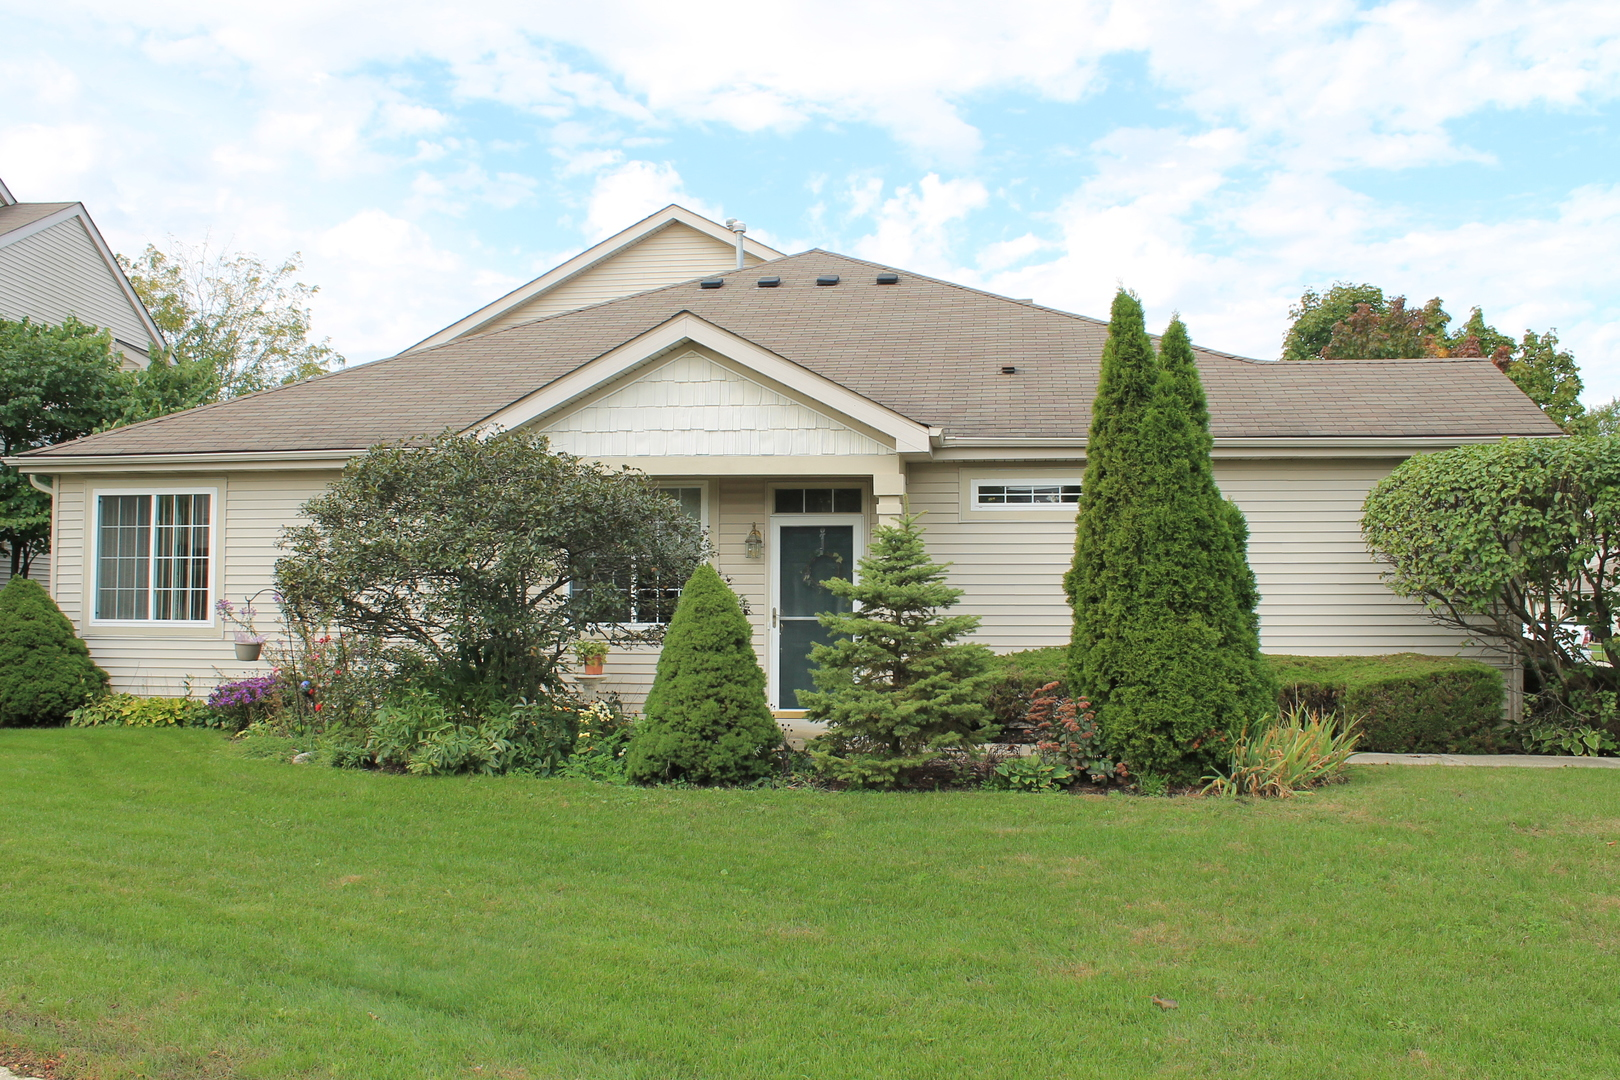 6423 Cherrywood, Fox Lake, Illinois, 60020